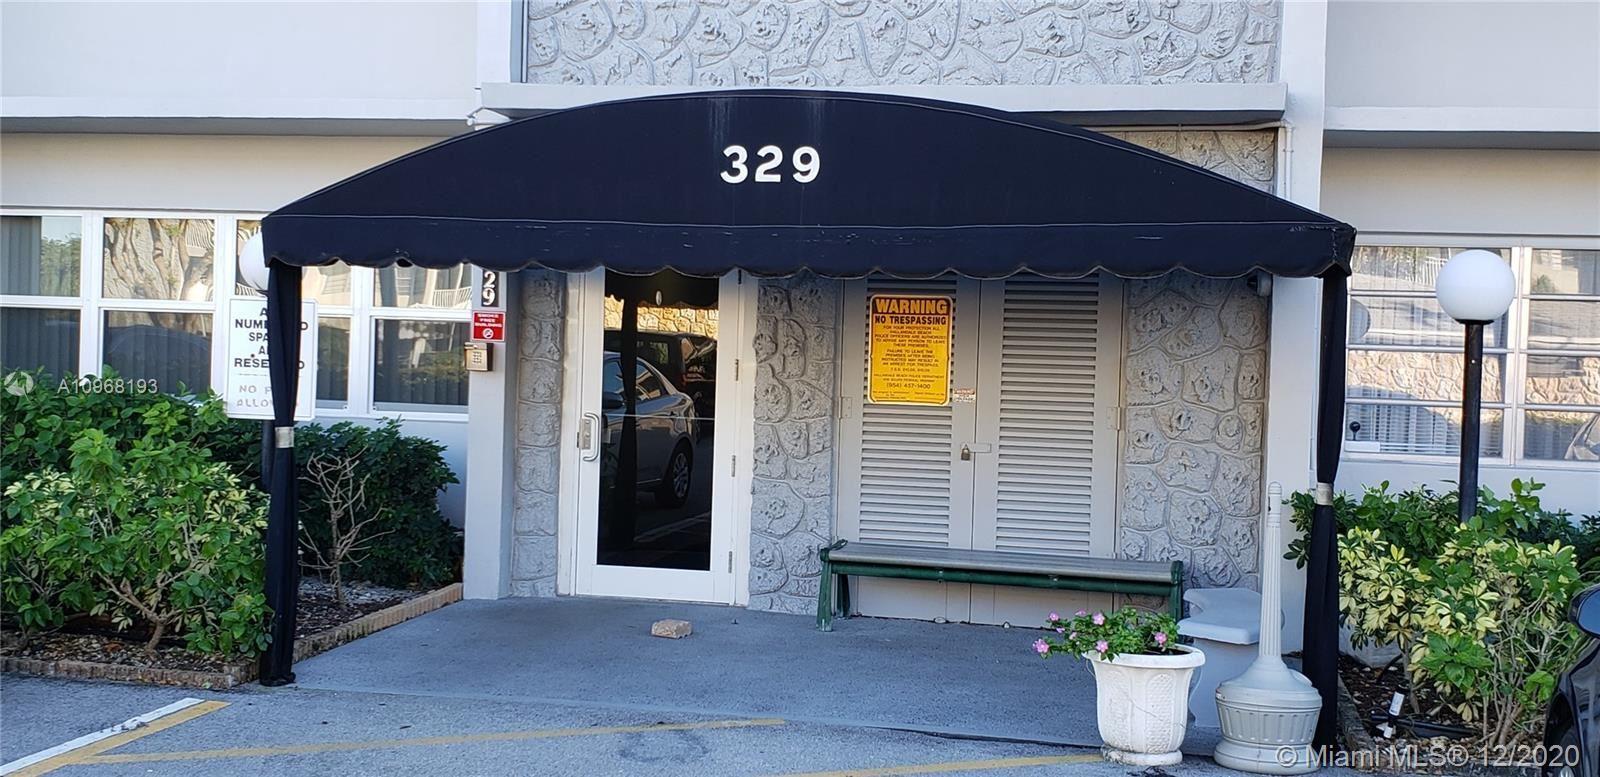 329 SE 3rd St #303P, Hallandale Beach, FL 33009 - #: A10968193